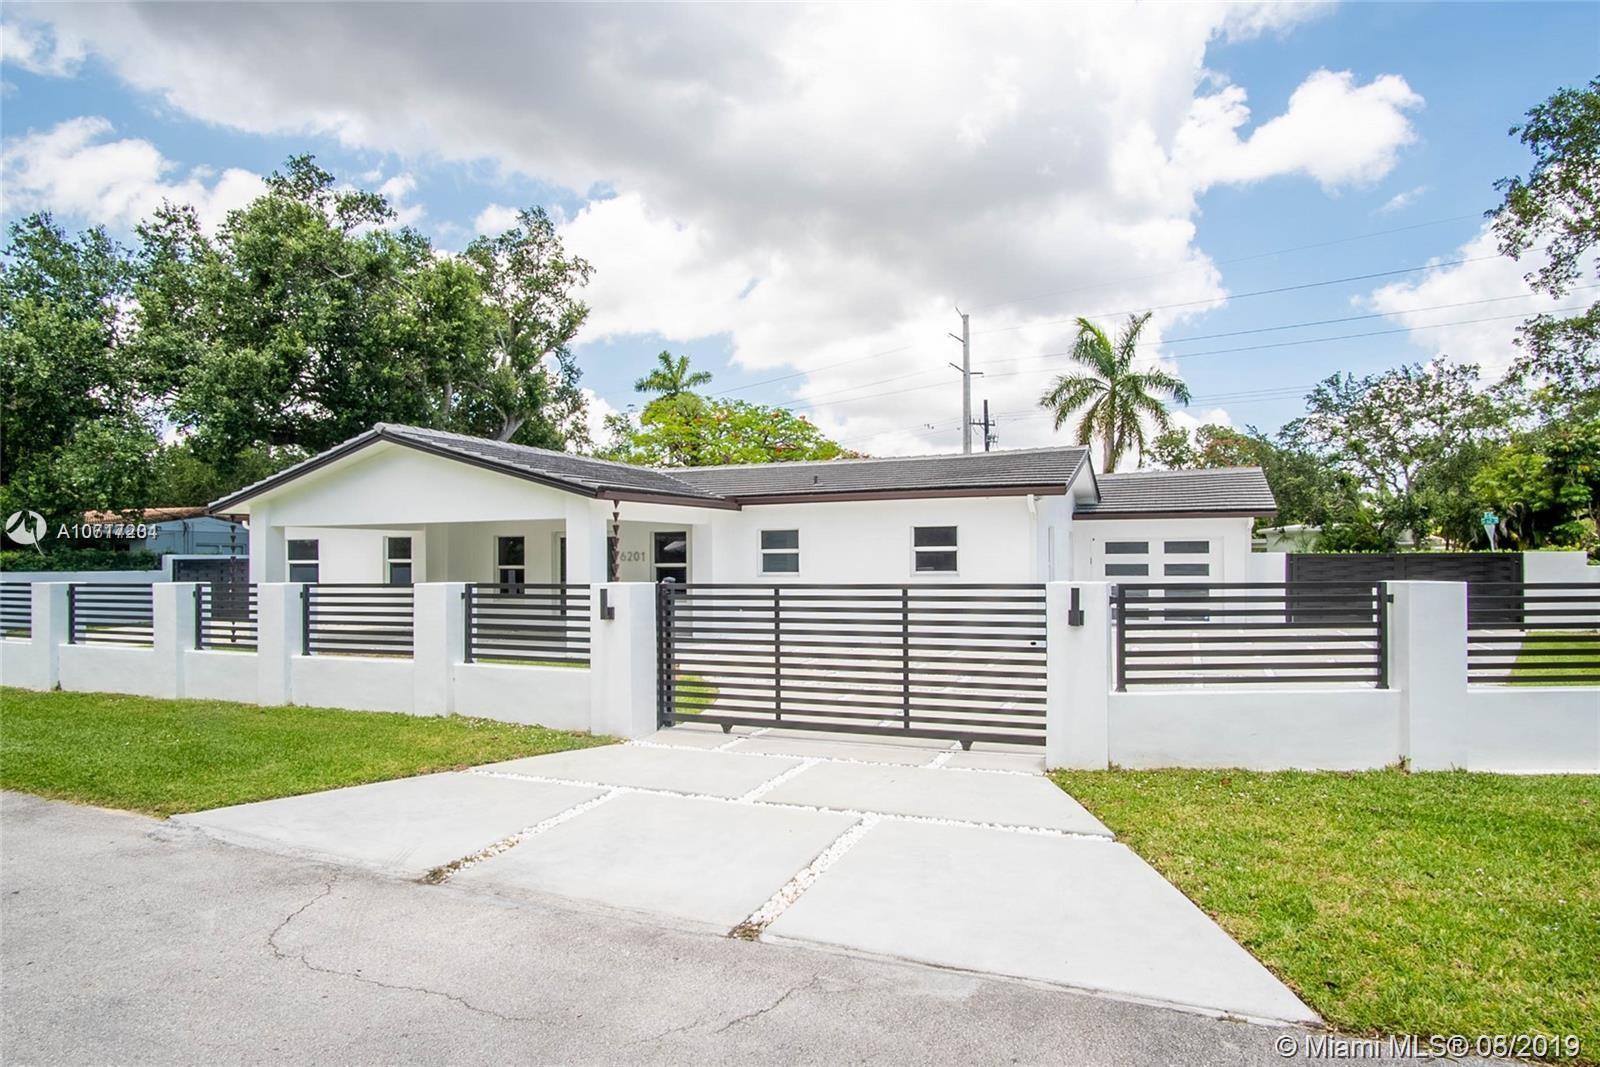 6201 Coral Lake, Miami, FL 33155